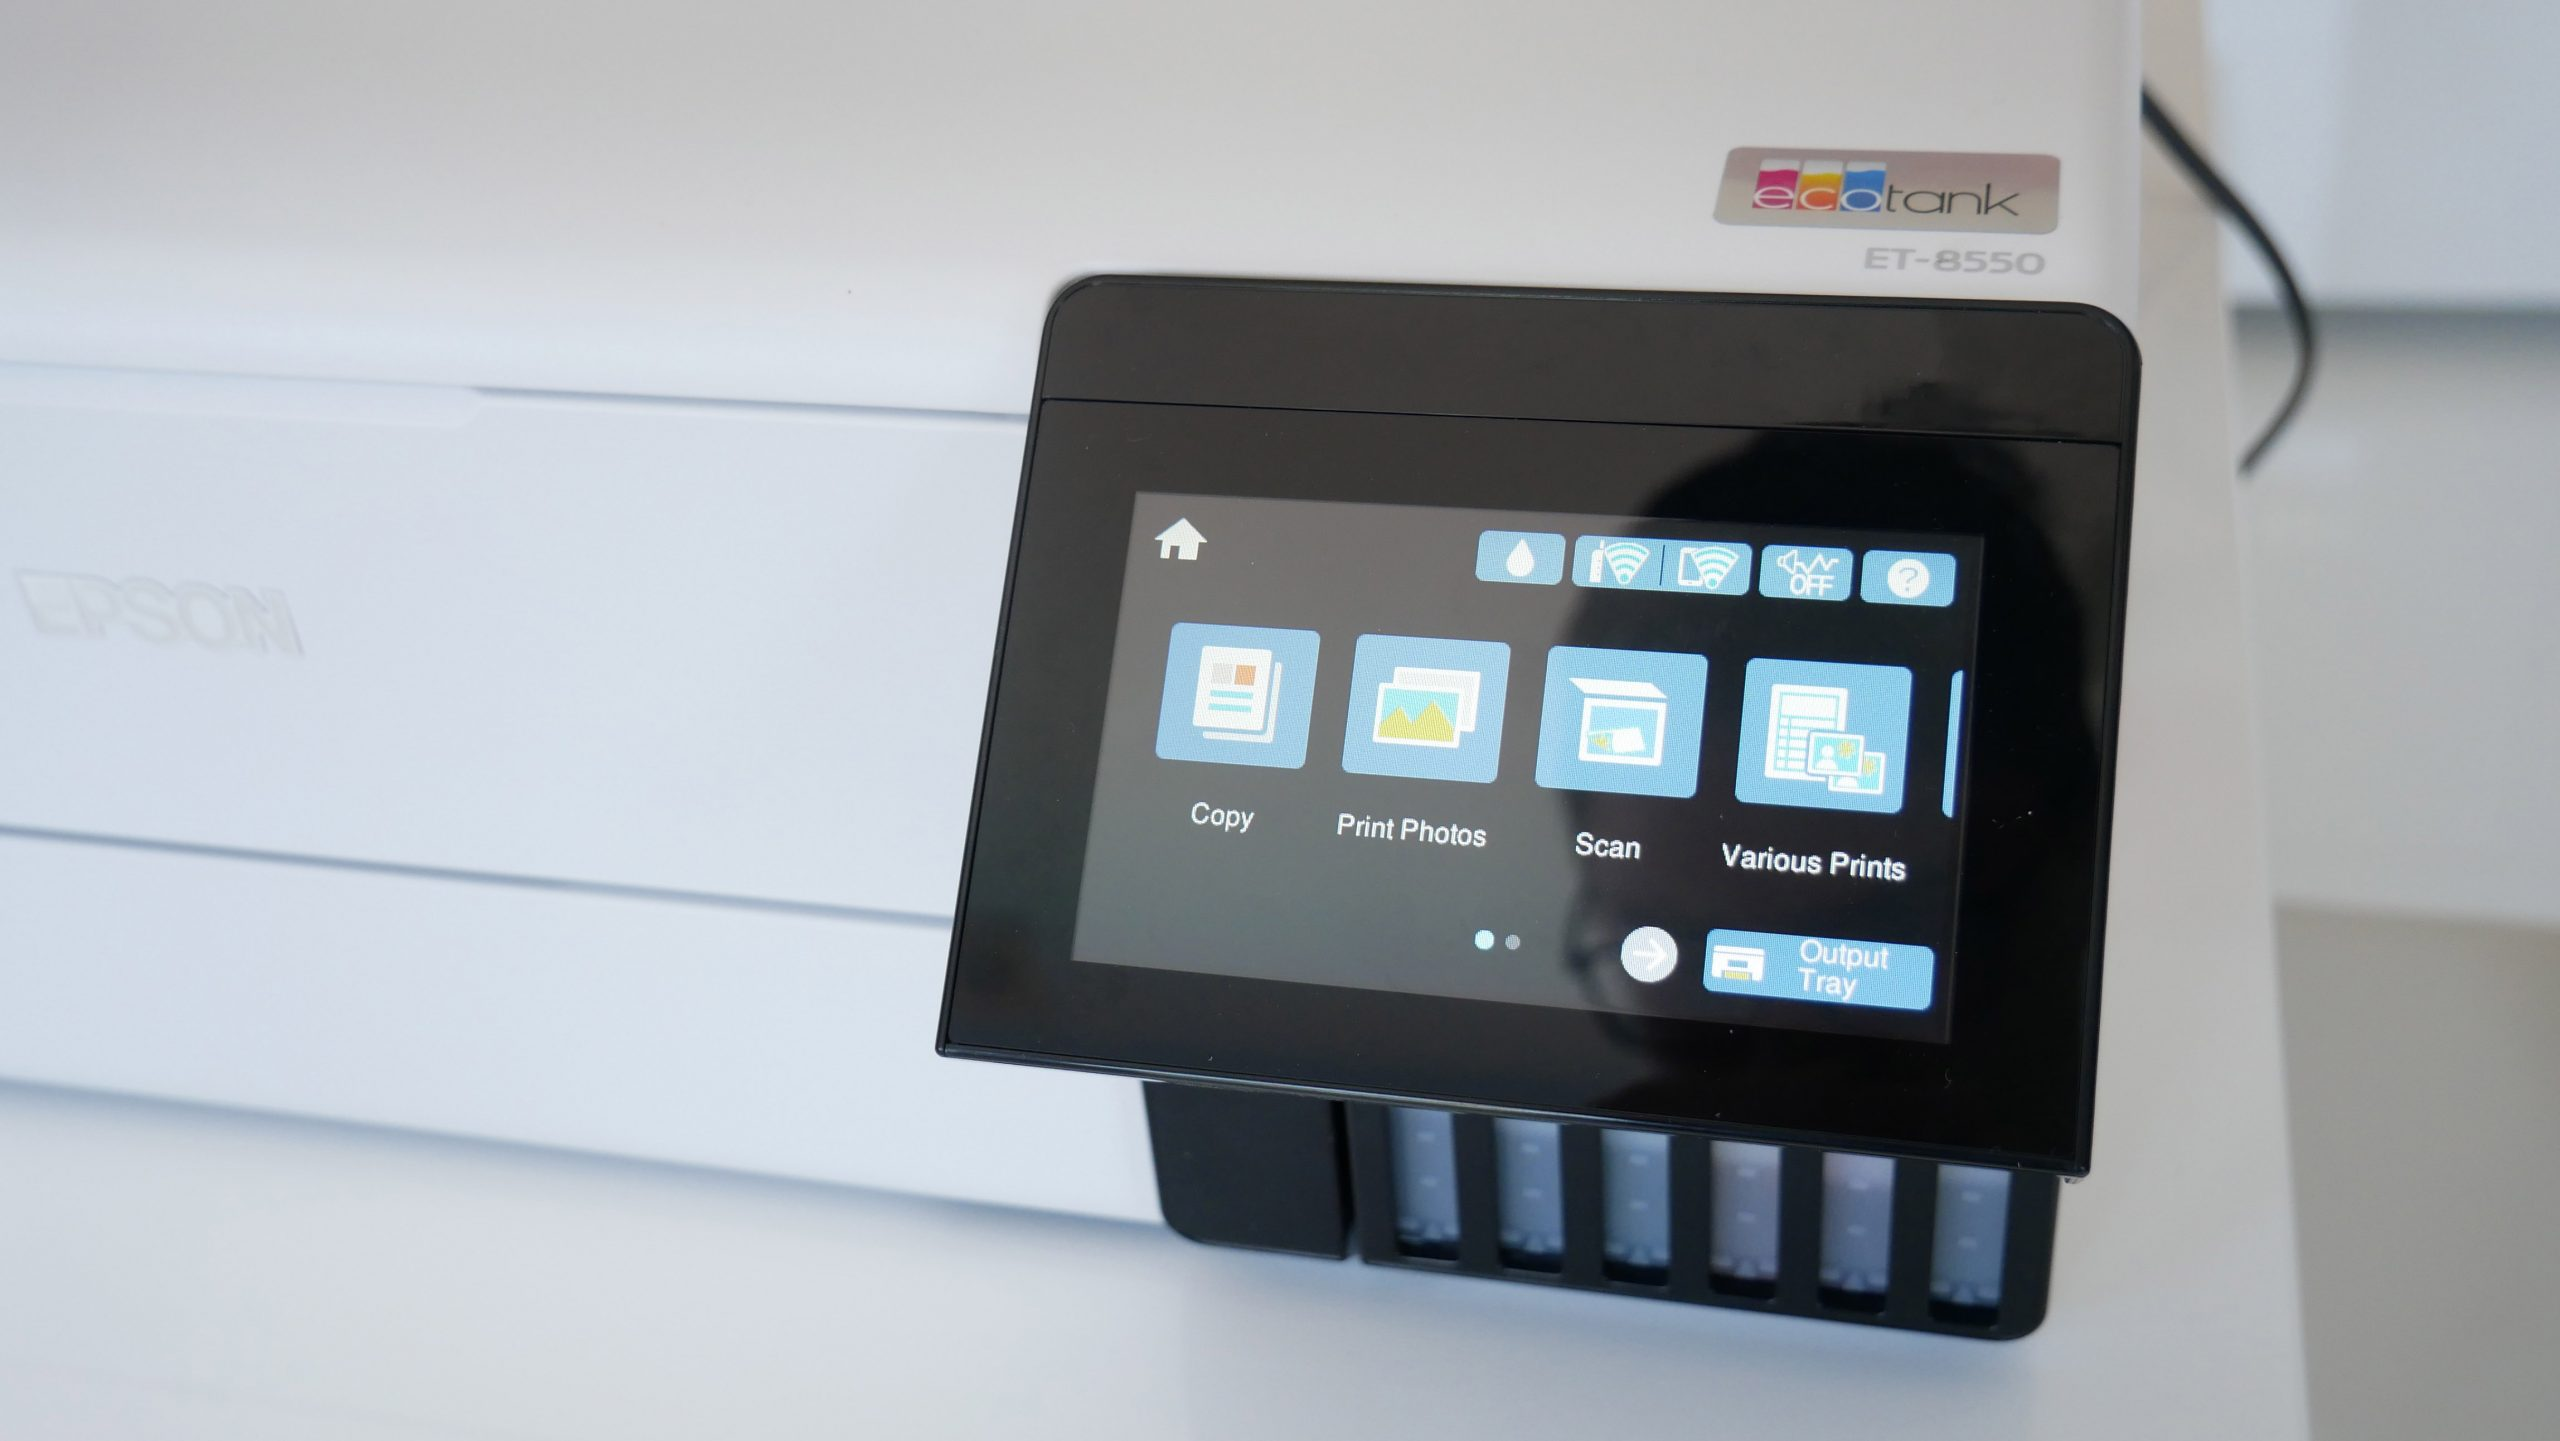 Image of EcoTank Photo ET-8550 touchscreen